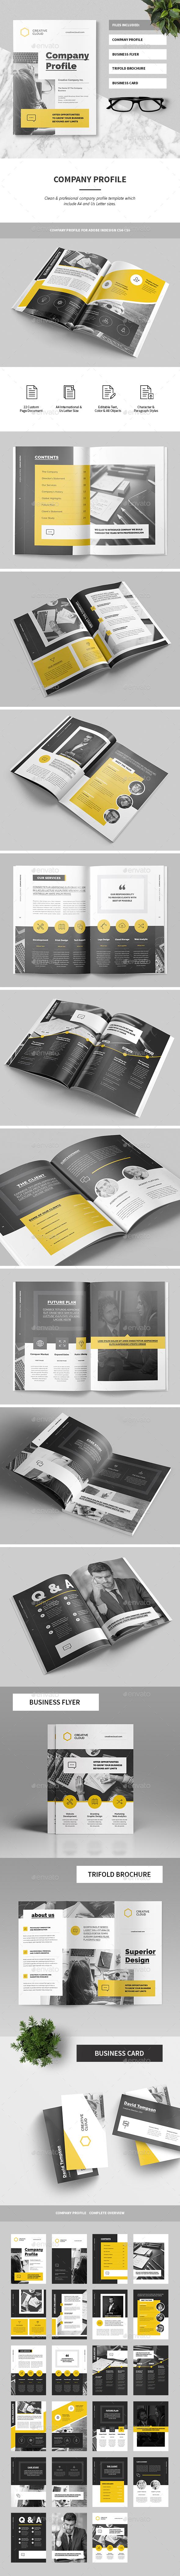 Company Profile Indesign Template Gallery - Template Design Ideas